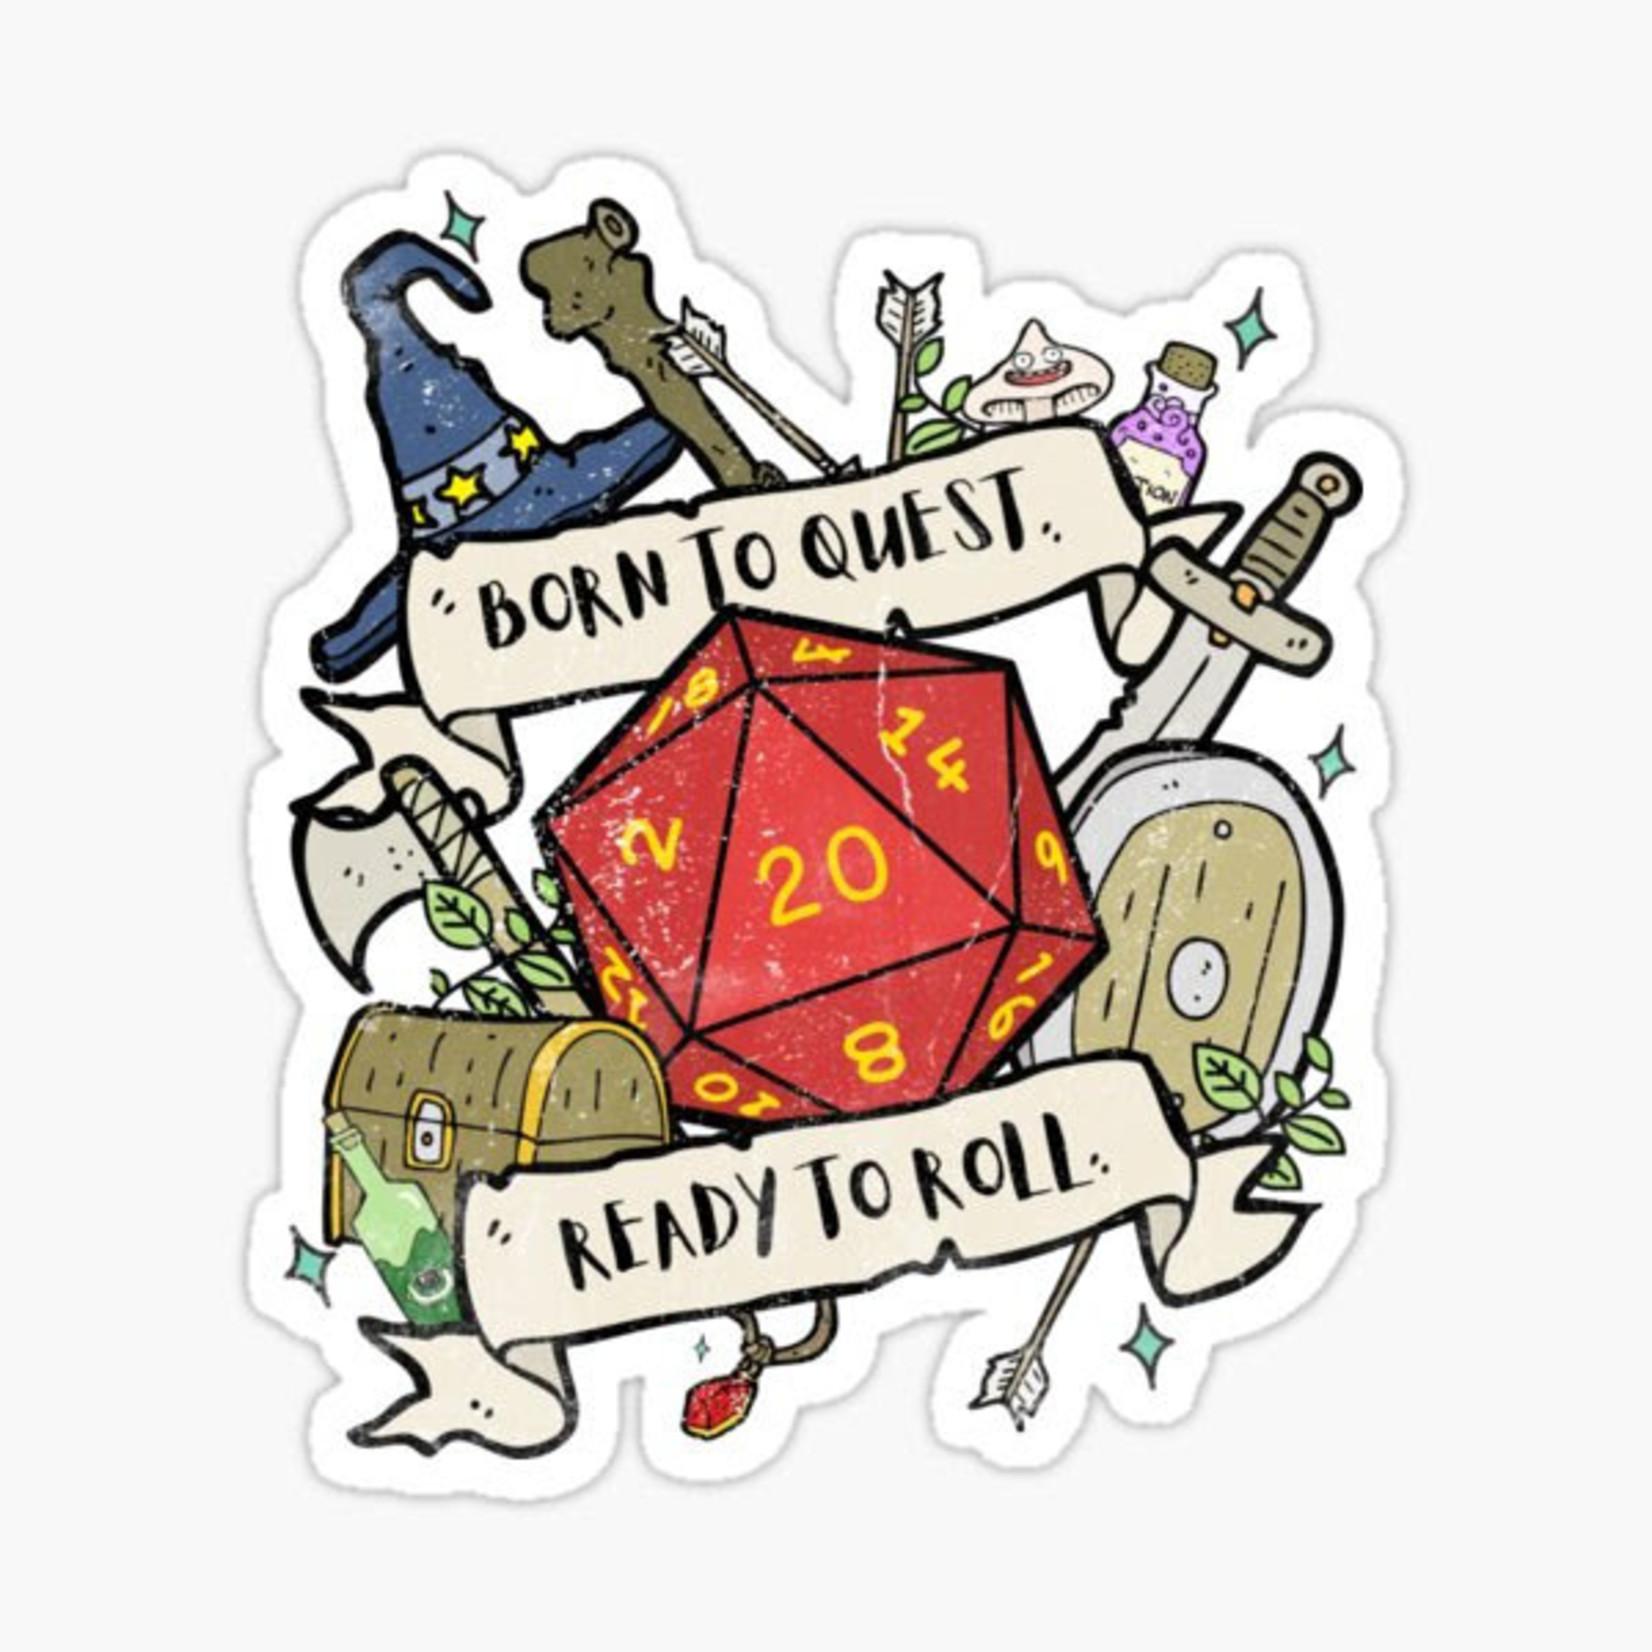 Born To Quest RPG Sticker